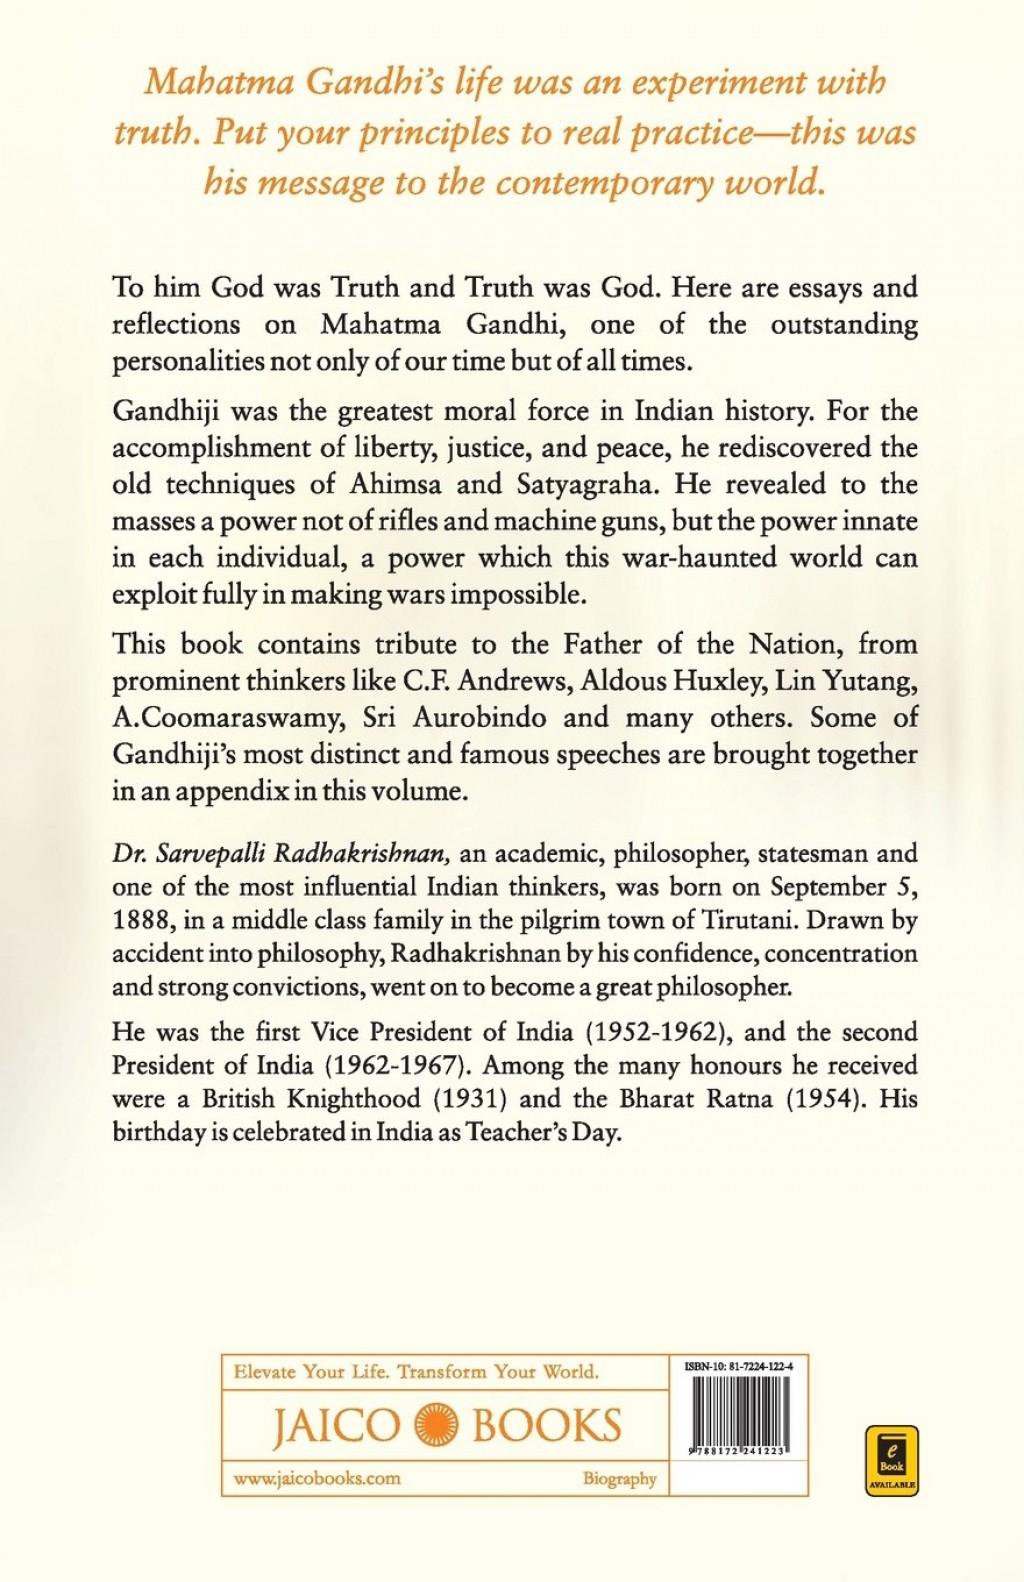 009 Gandhiji Essay 71zp3a1uw8l Sensational Mahatma Gandhi In Gujarati Pdf Free Download Hindi Language Ma Nibandh Large